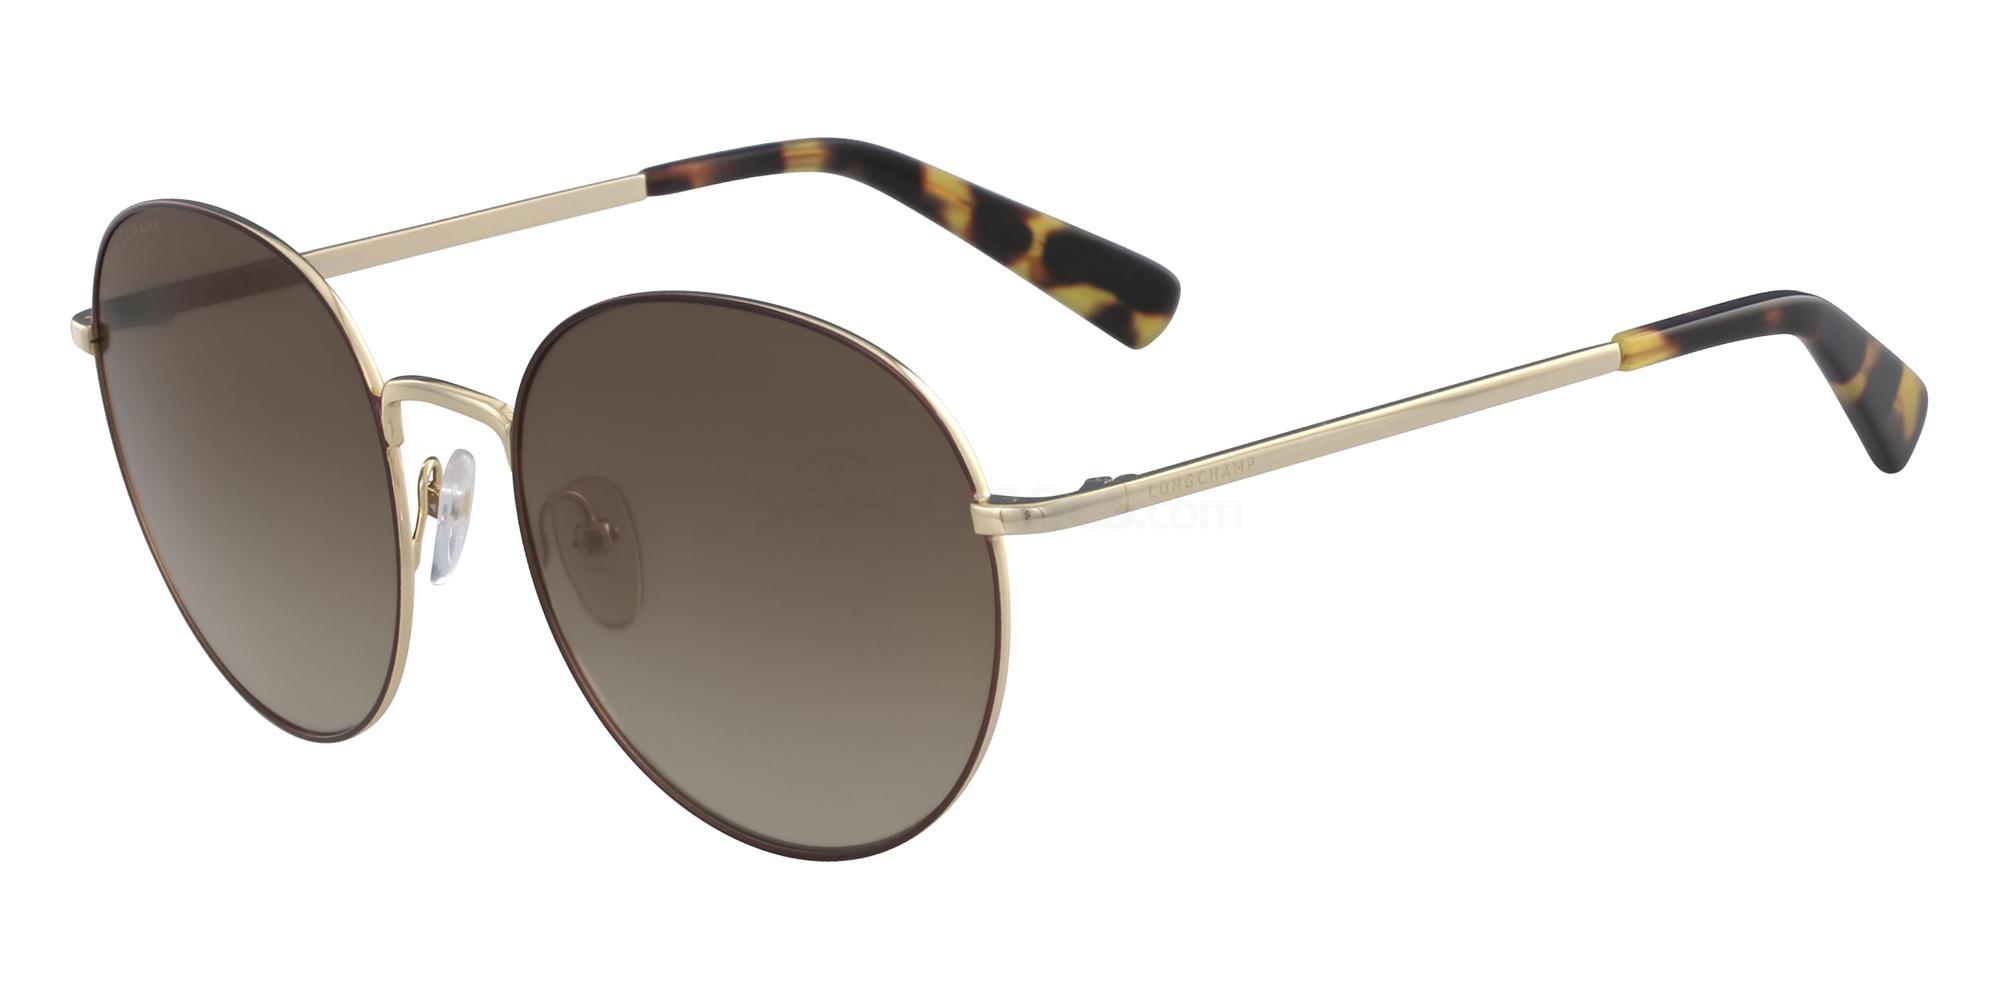 715 LO101S Sunglasses, LONGCHAMP